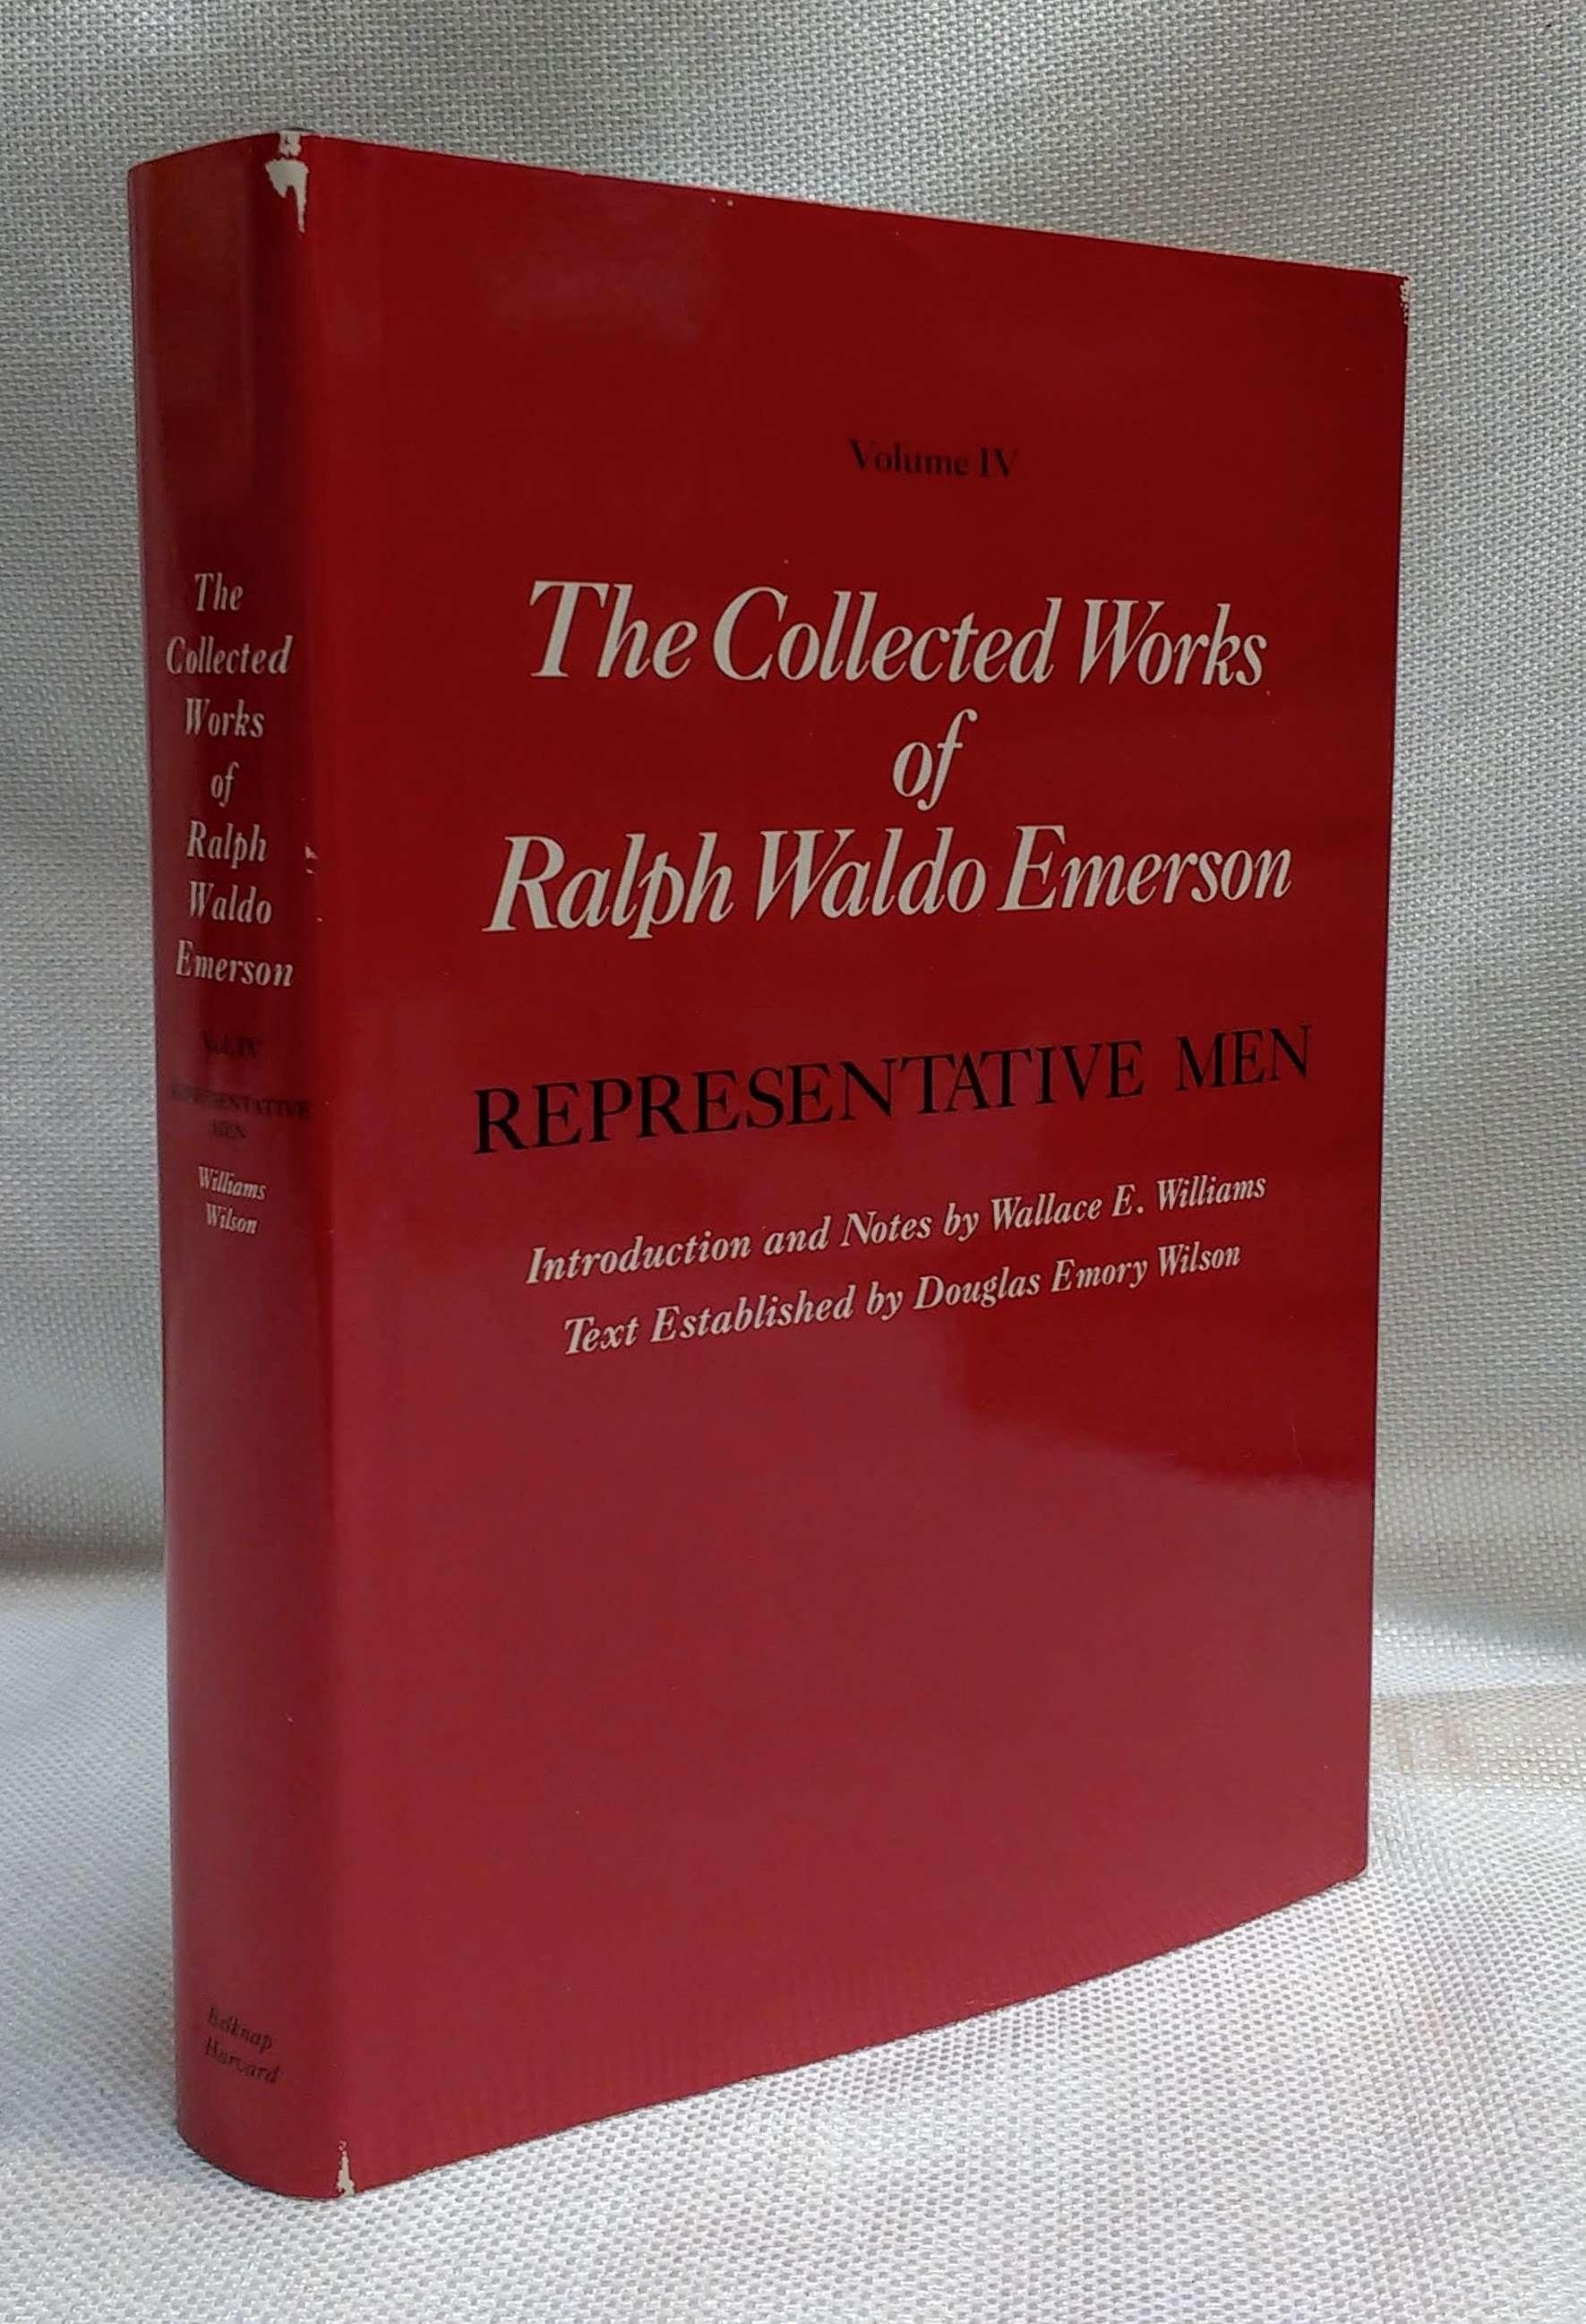 Collected Works of Ralph Waldo Emerson, Volume IV: Representative Men, Emerson, Ralph Waldo; Williams, Wallace E. [Editor]; Wilson, Douglas Emory [Editor];